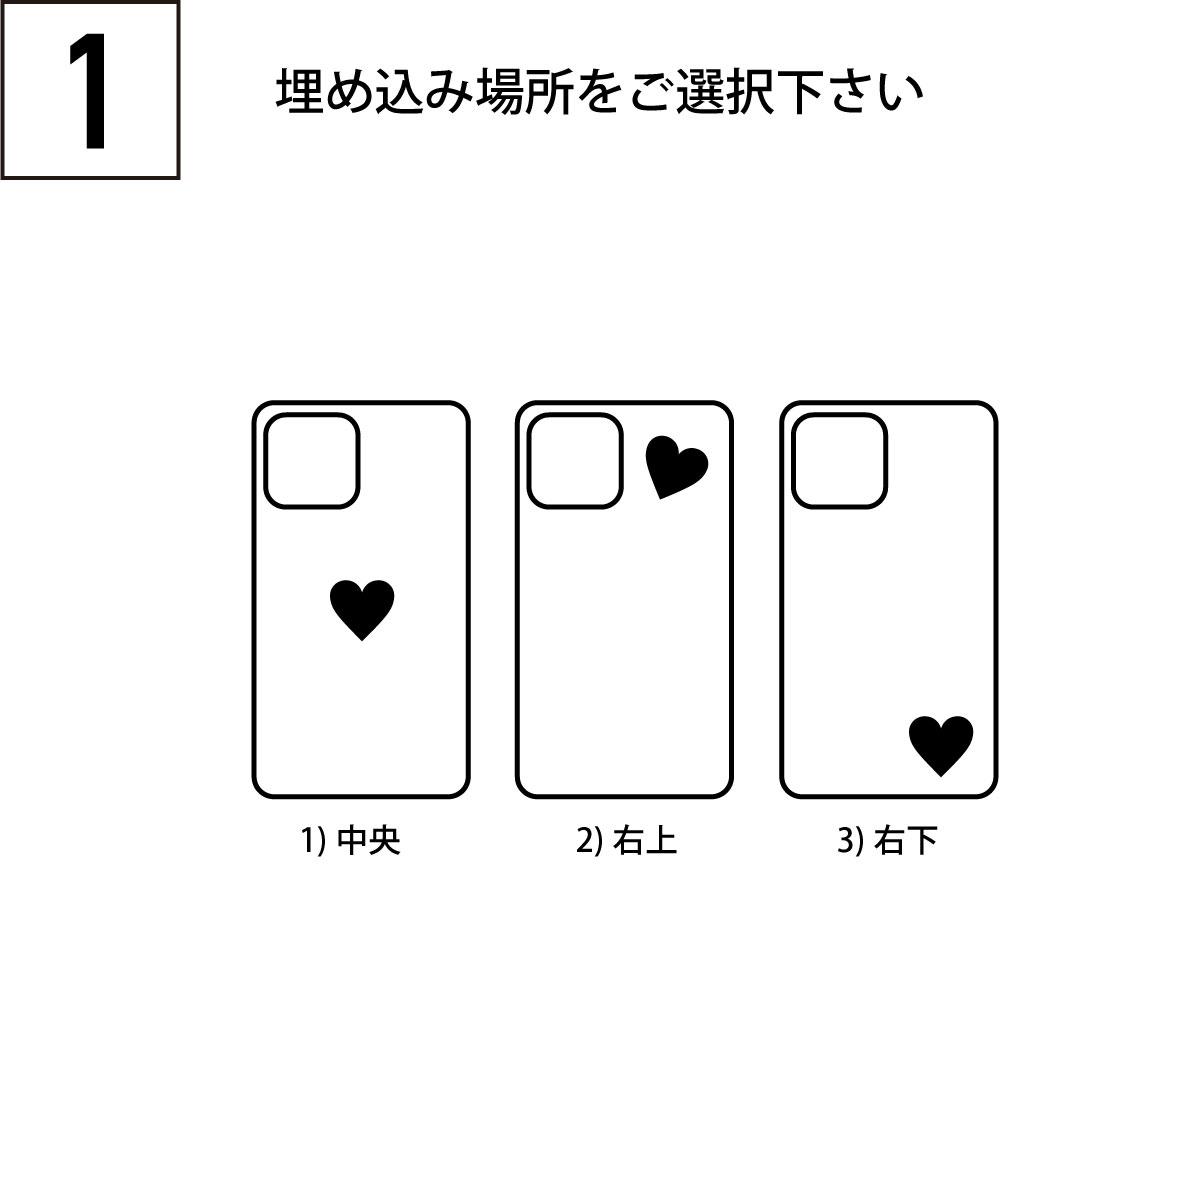 iPhoneOpenCase:    Option7:ハート(小)埋込追加